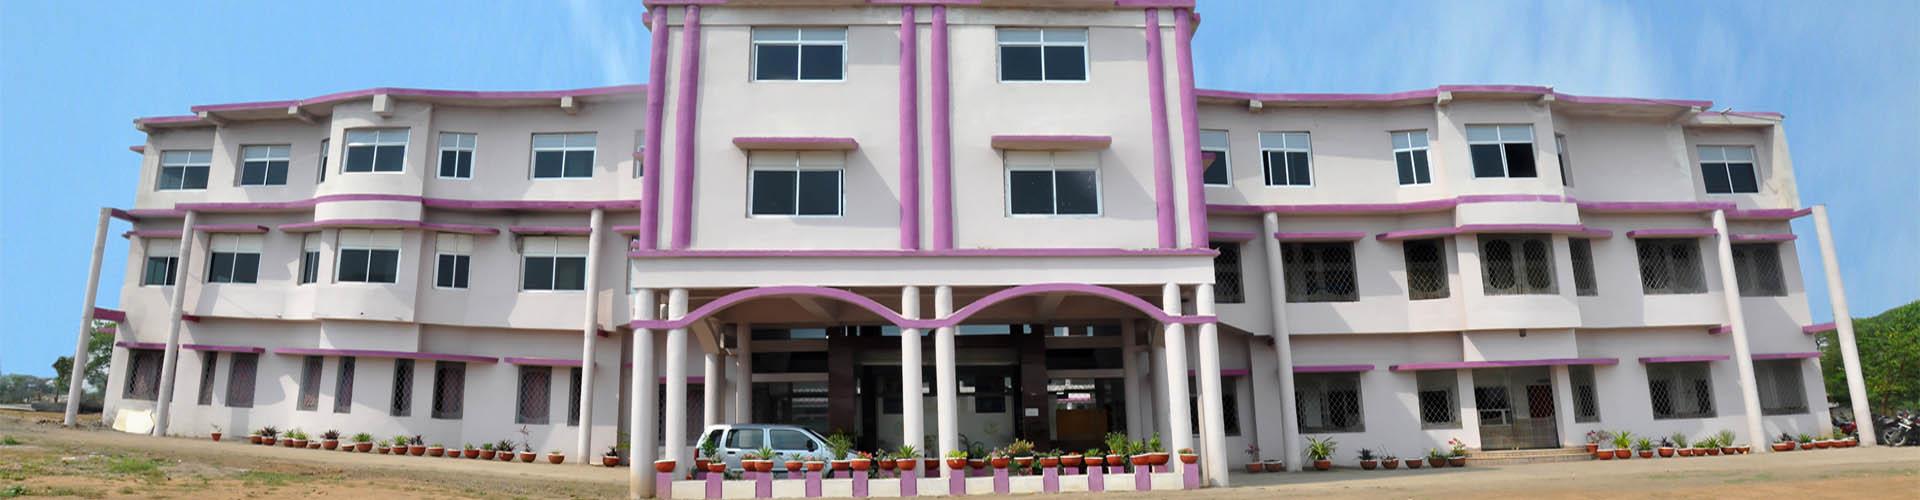 Saraswati Institute of Engineering and Technology, Jabalpur Image